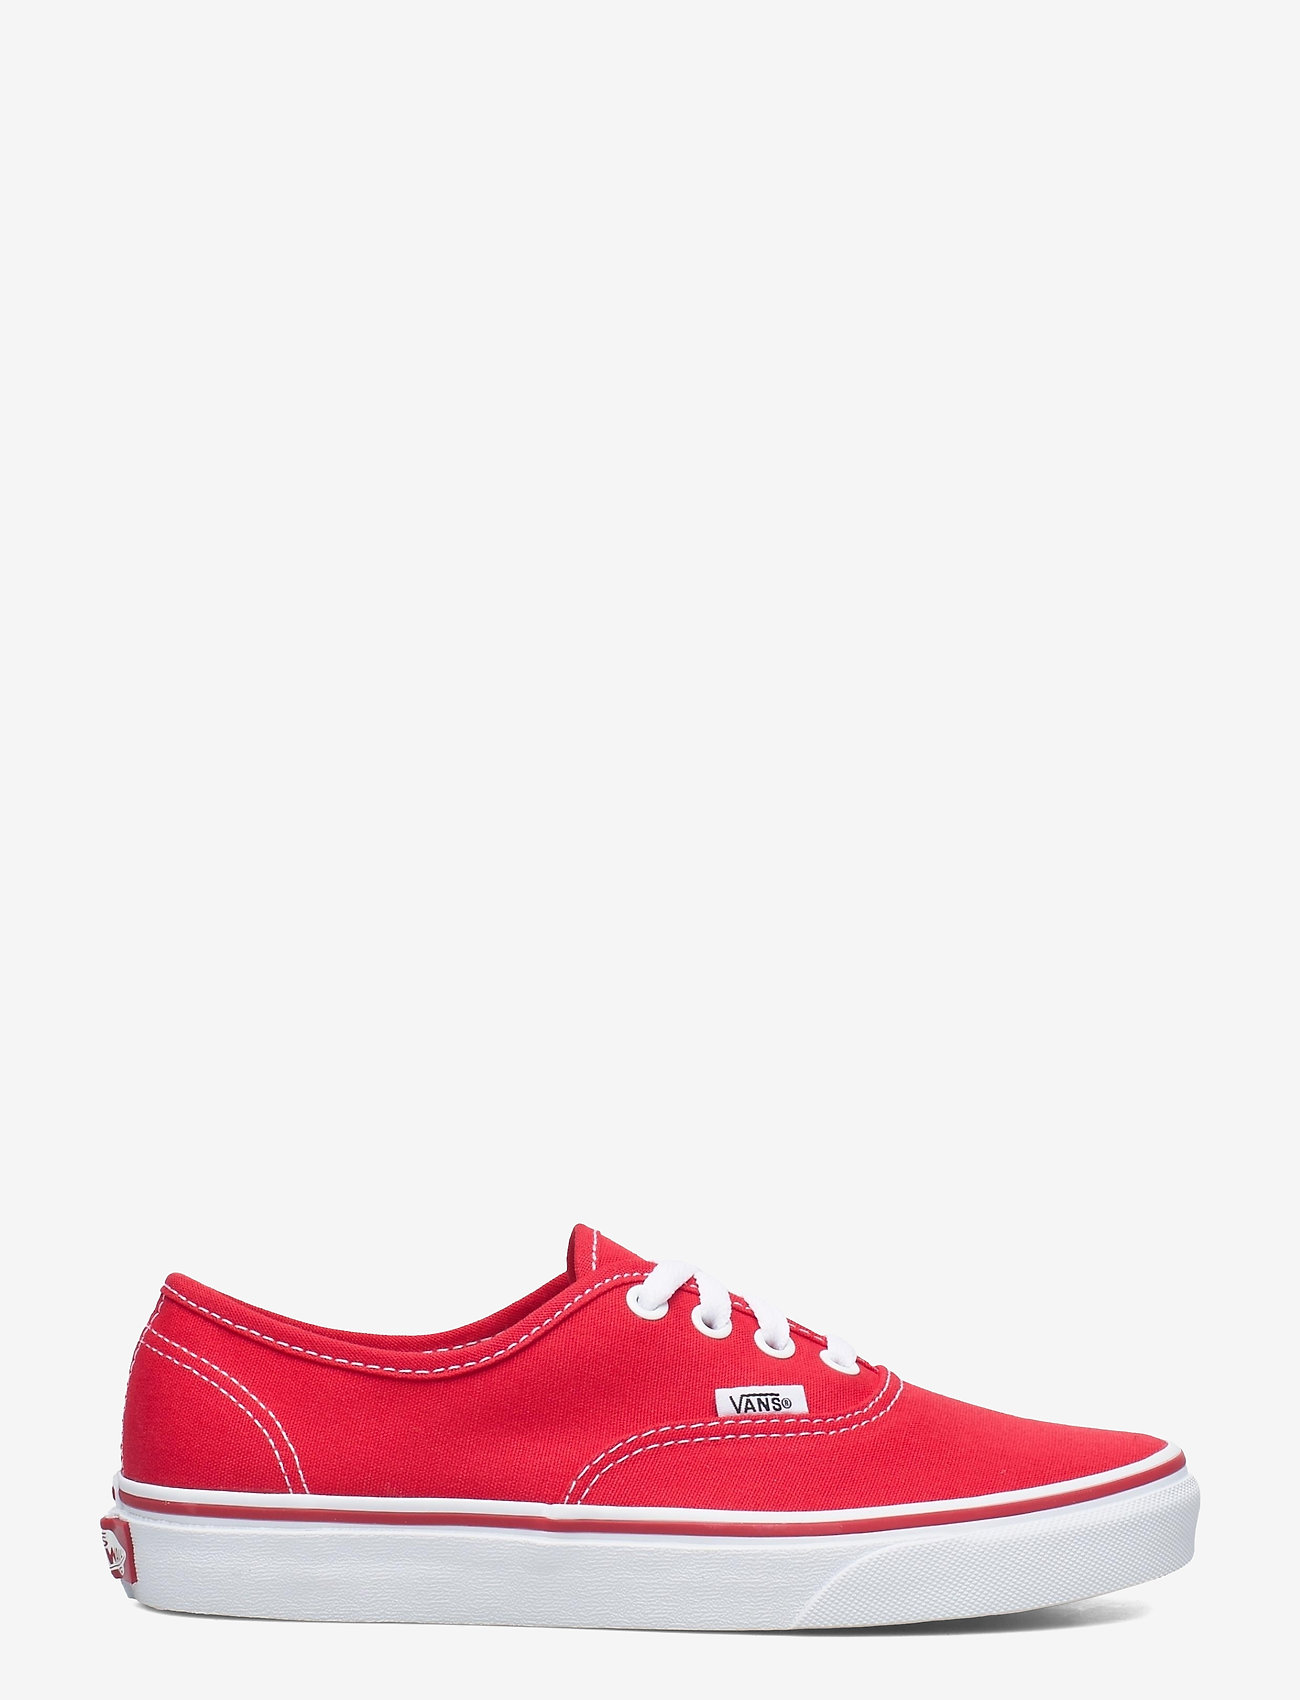 VANS - UA Authentic - laag sneakers - red - 1